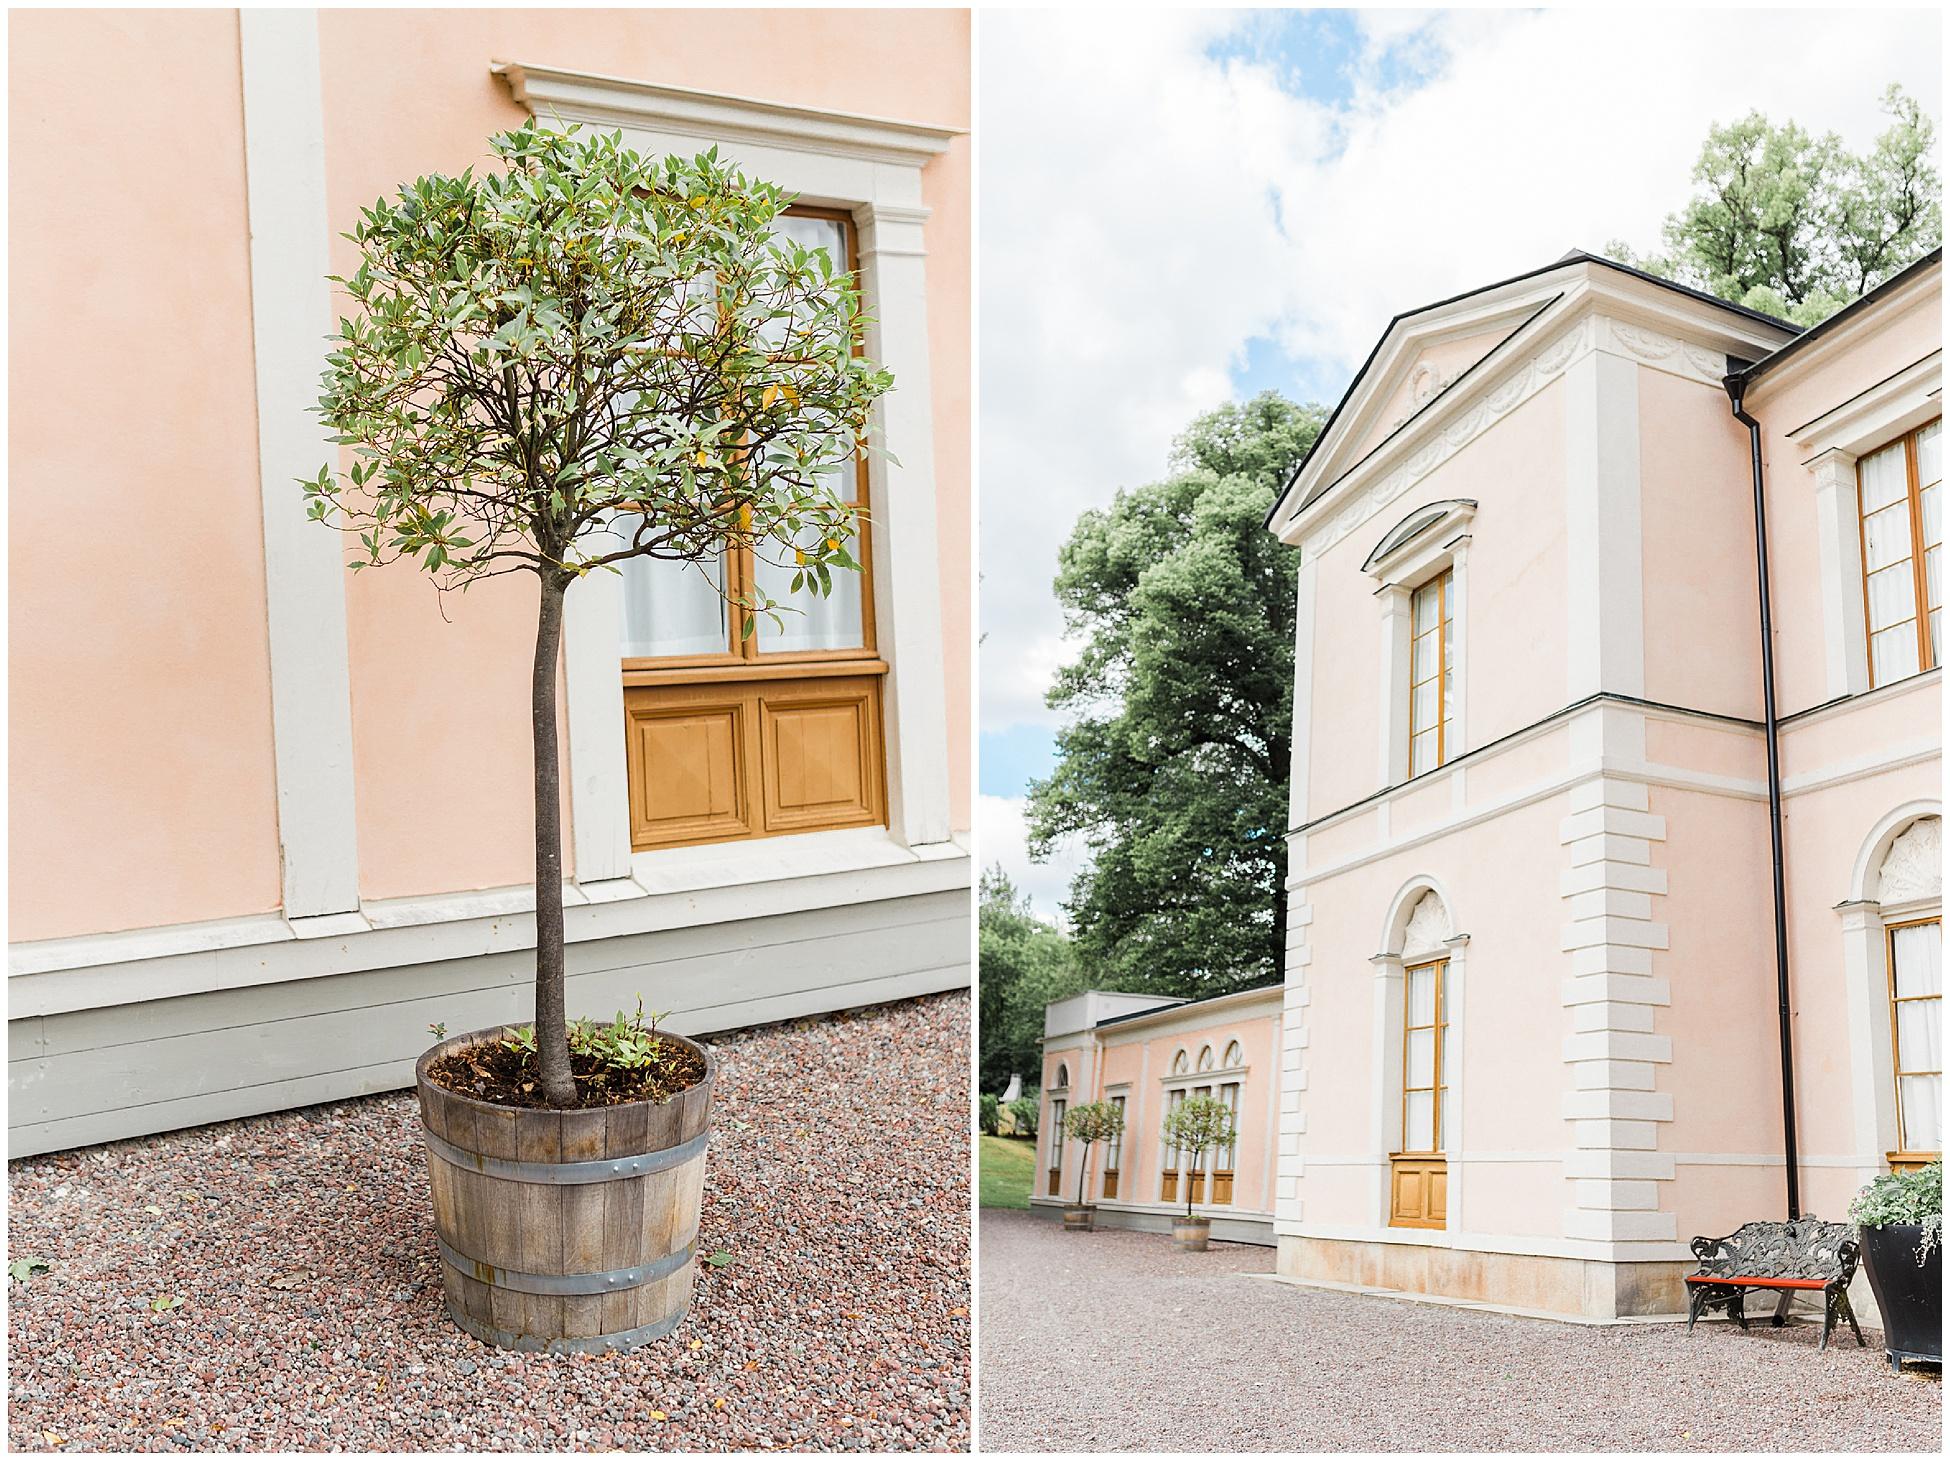 stockholm-035.jpg